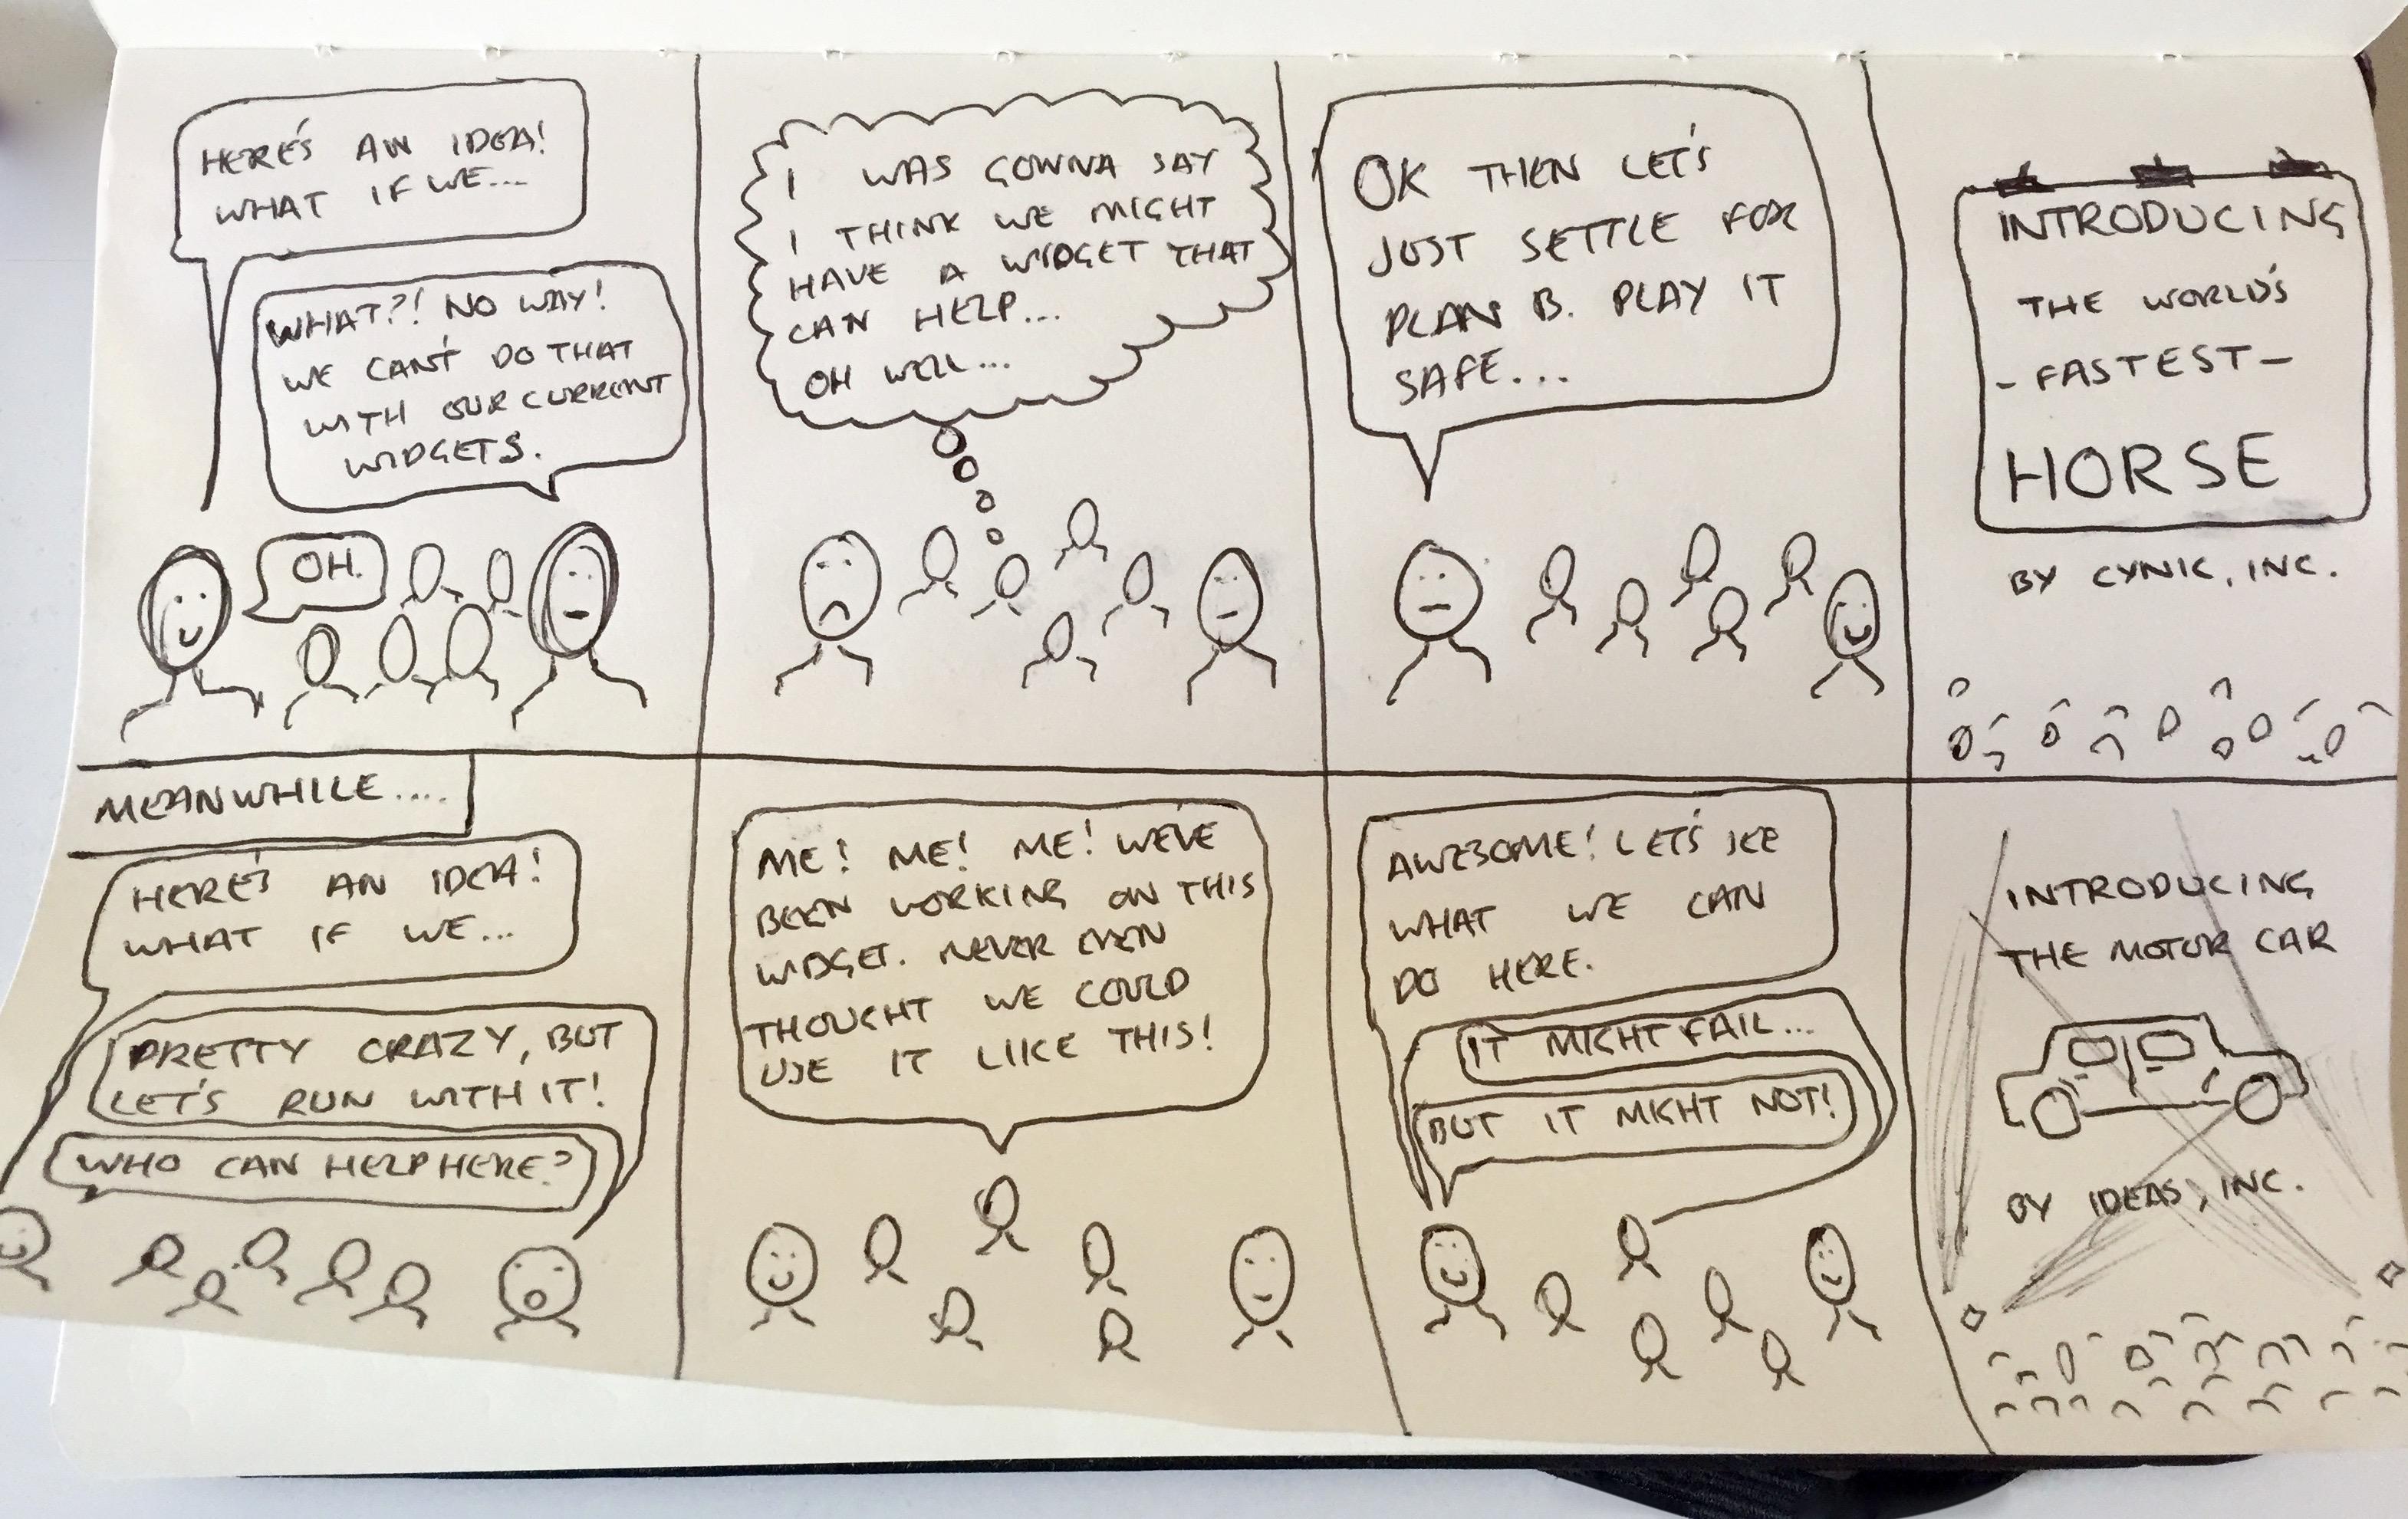 A cartoon about cynic, inc and ideas, inc